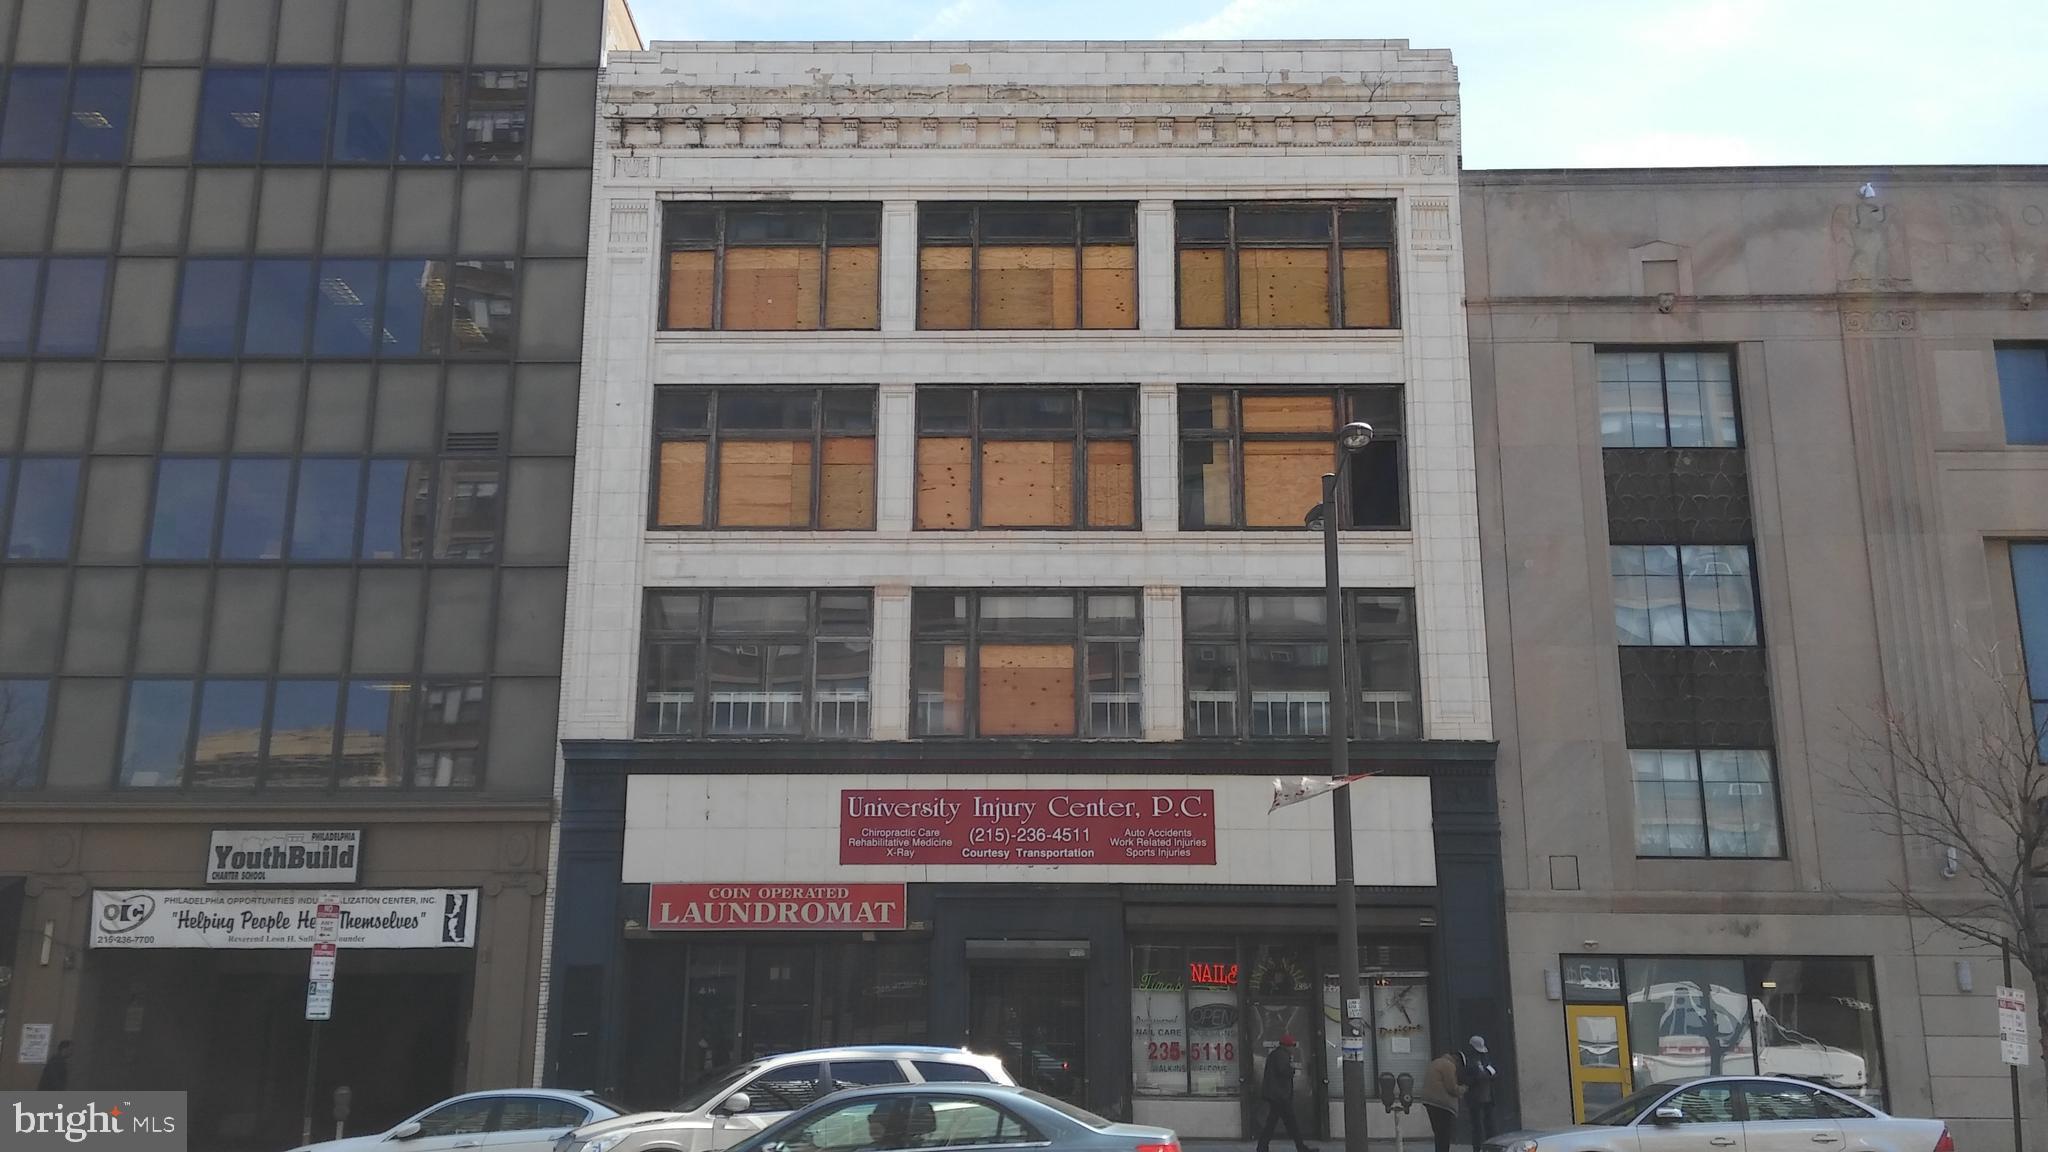 1227 N BROAD STREET, PHILADELPHIA, PA 19122